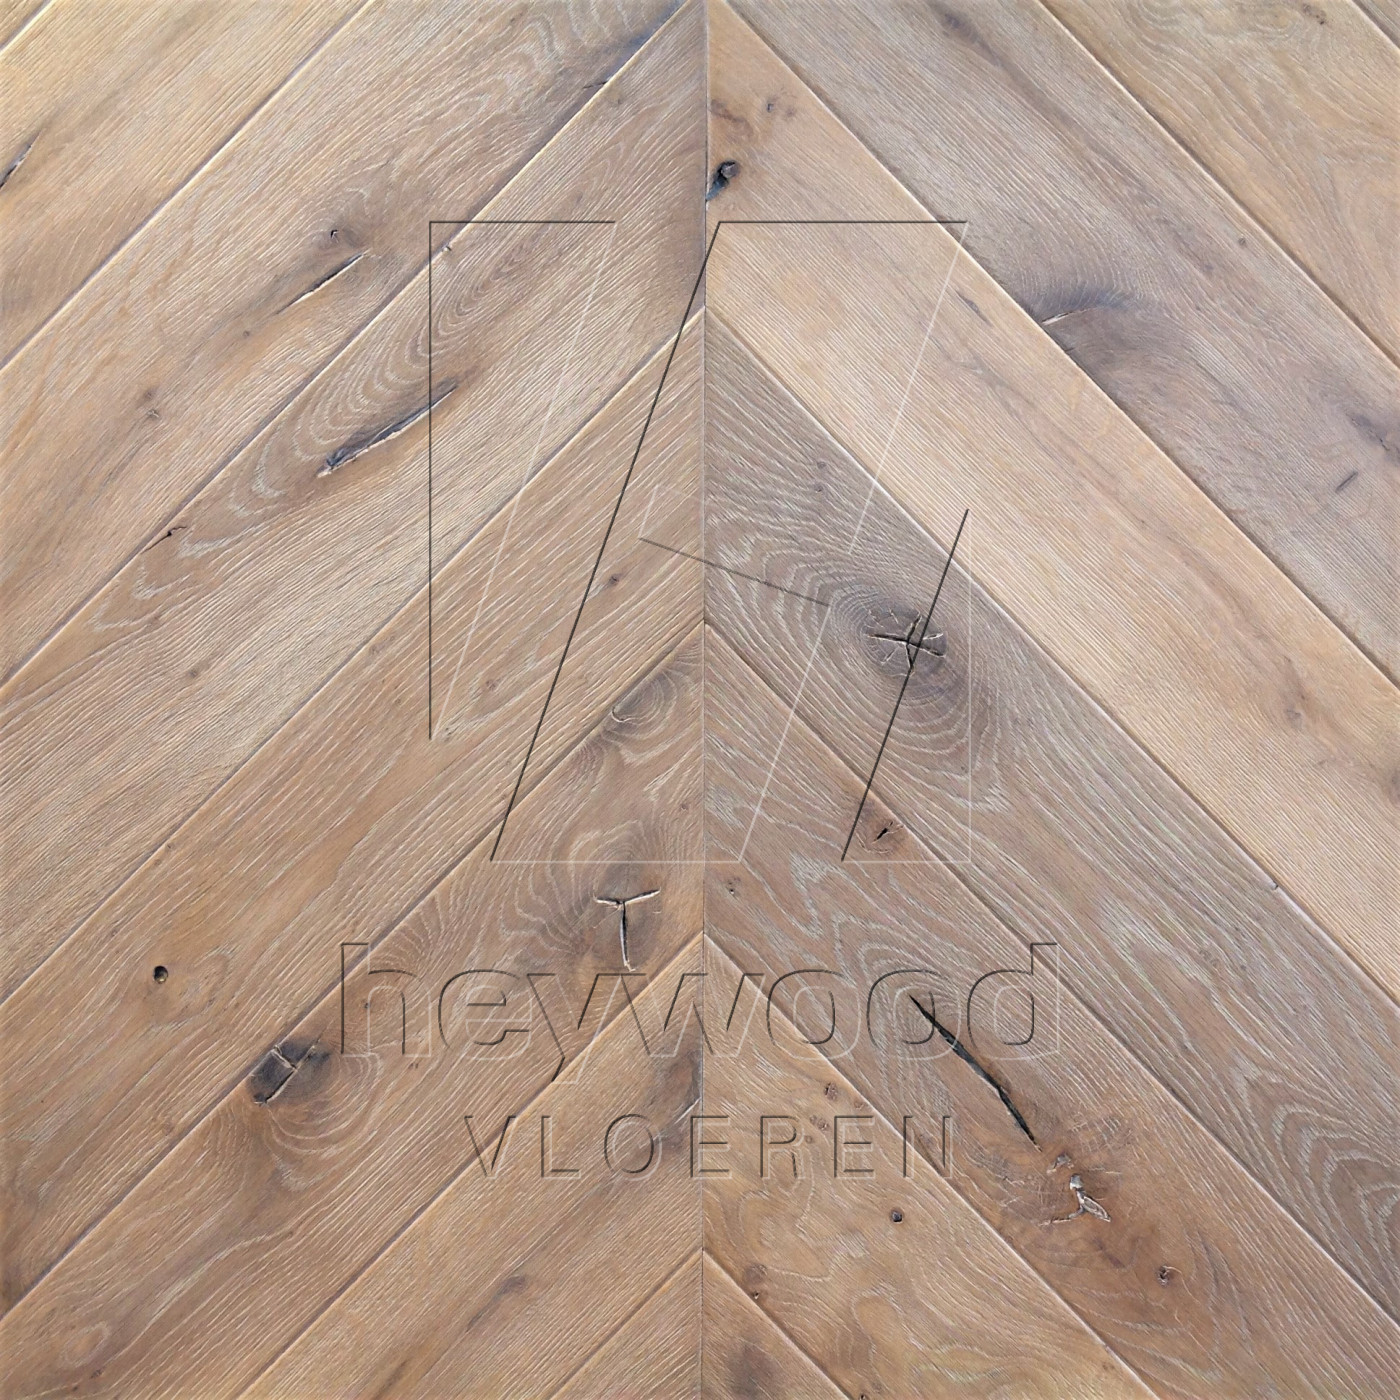 Antique Chevron 'Mont Blanc' in Chevron of Pattern & Panel Floors